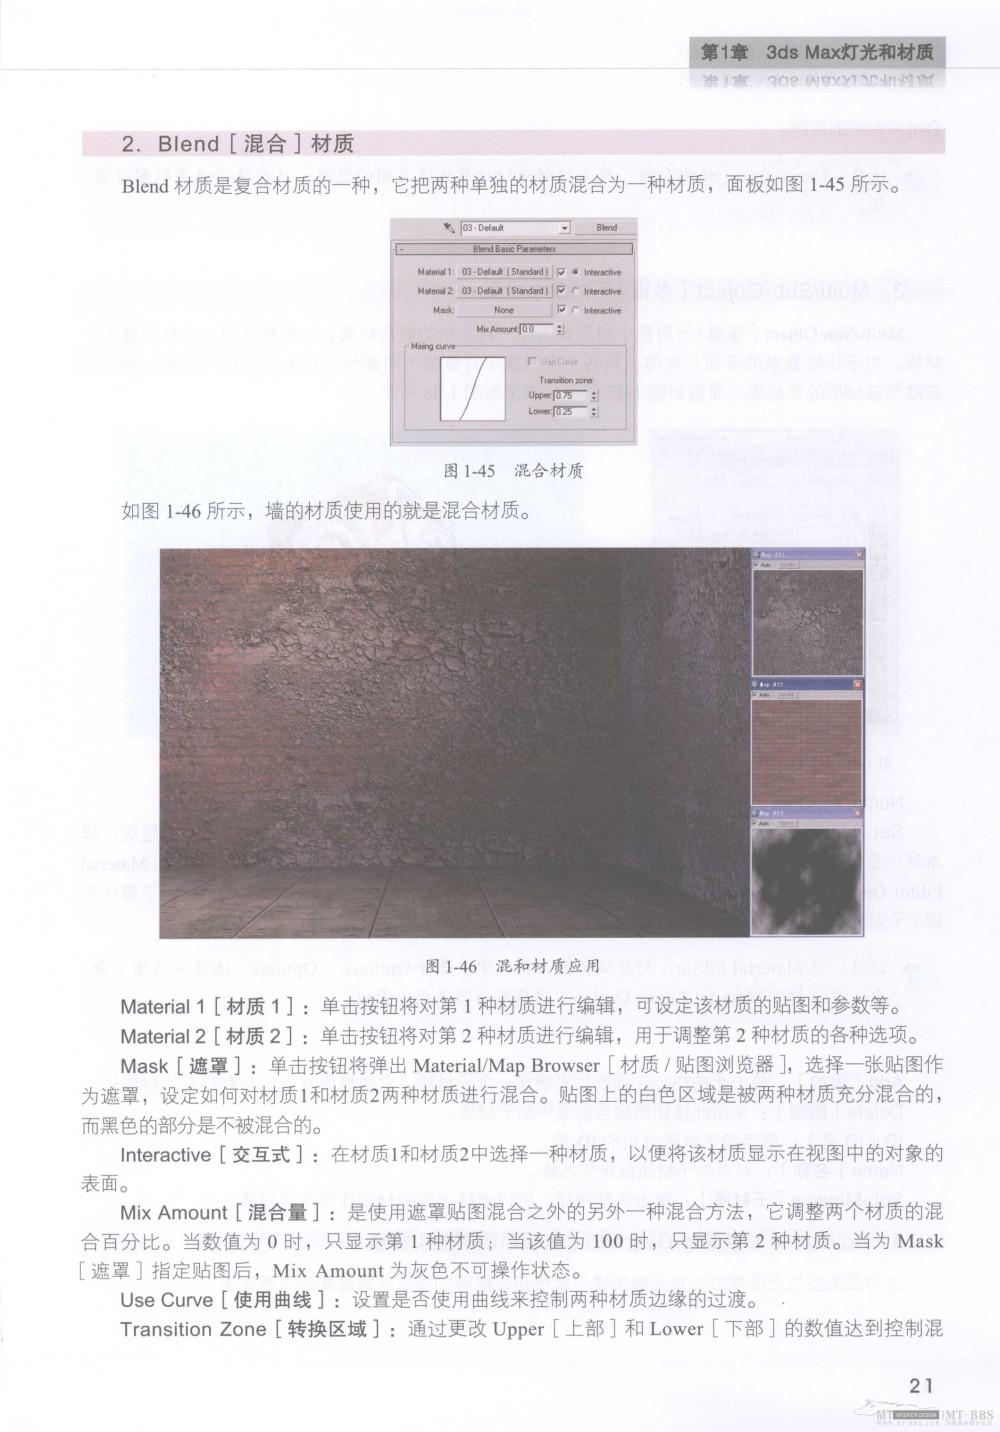 水晶石技法-3ds_Max&VRay室内空间表现_水晶石技法-3ds_Max&VRay室内空间表现_页面_027.jpg